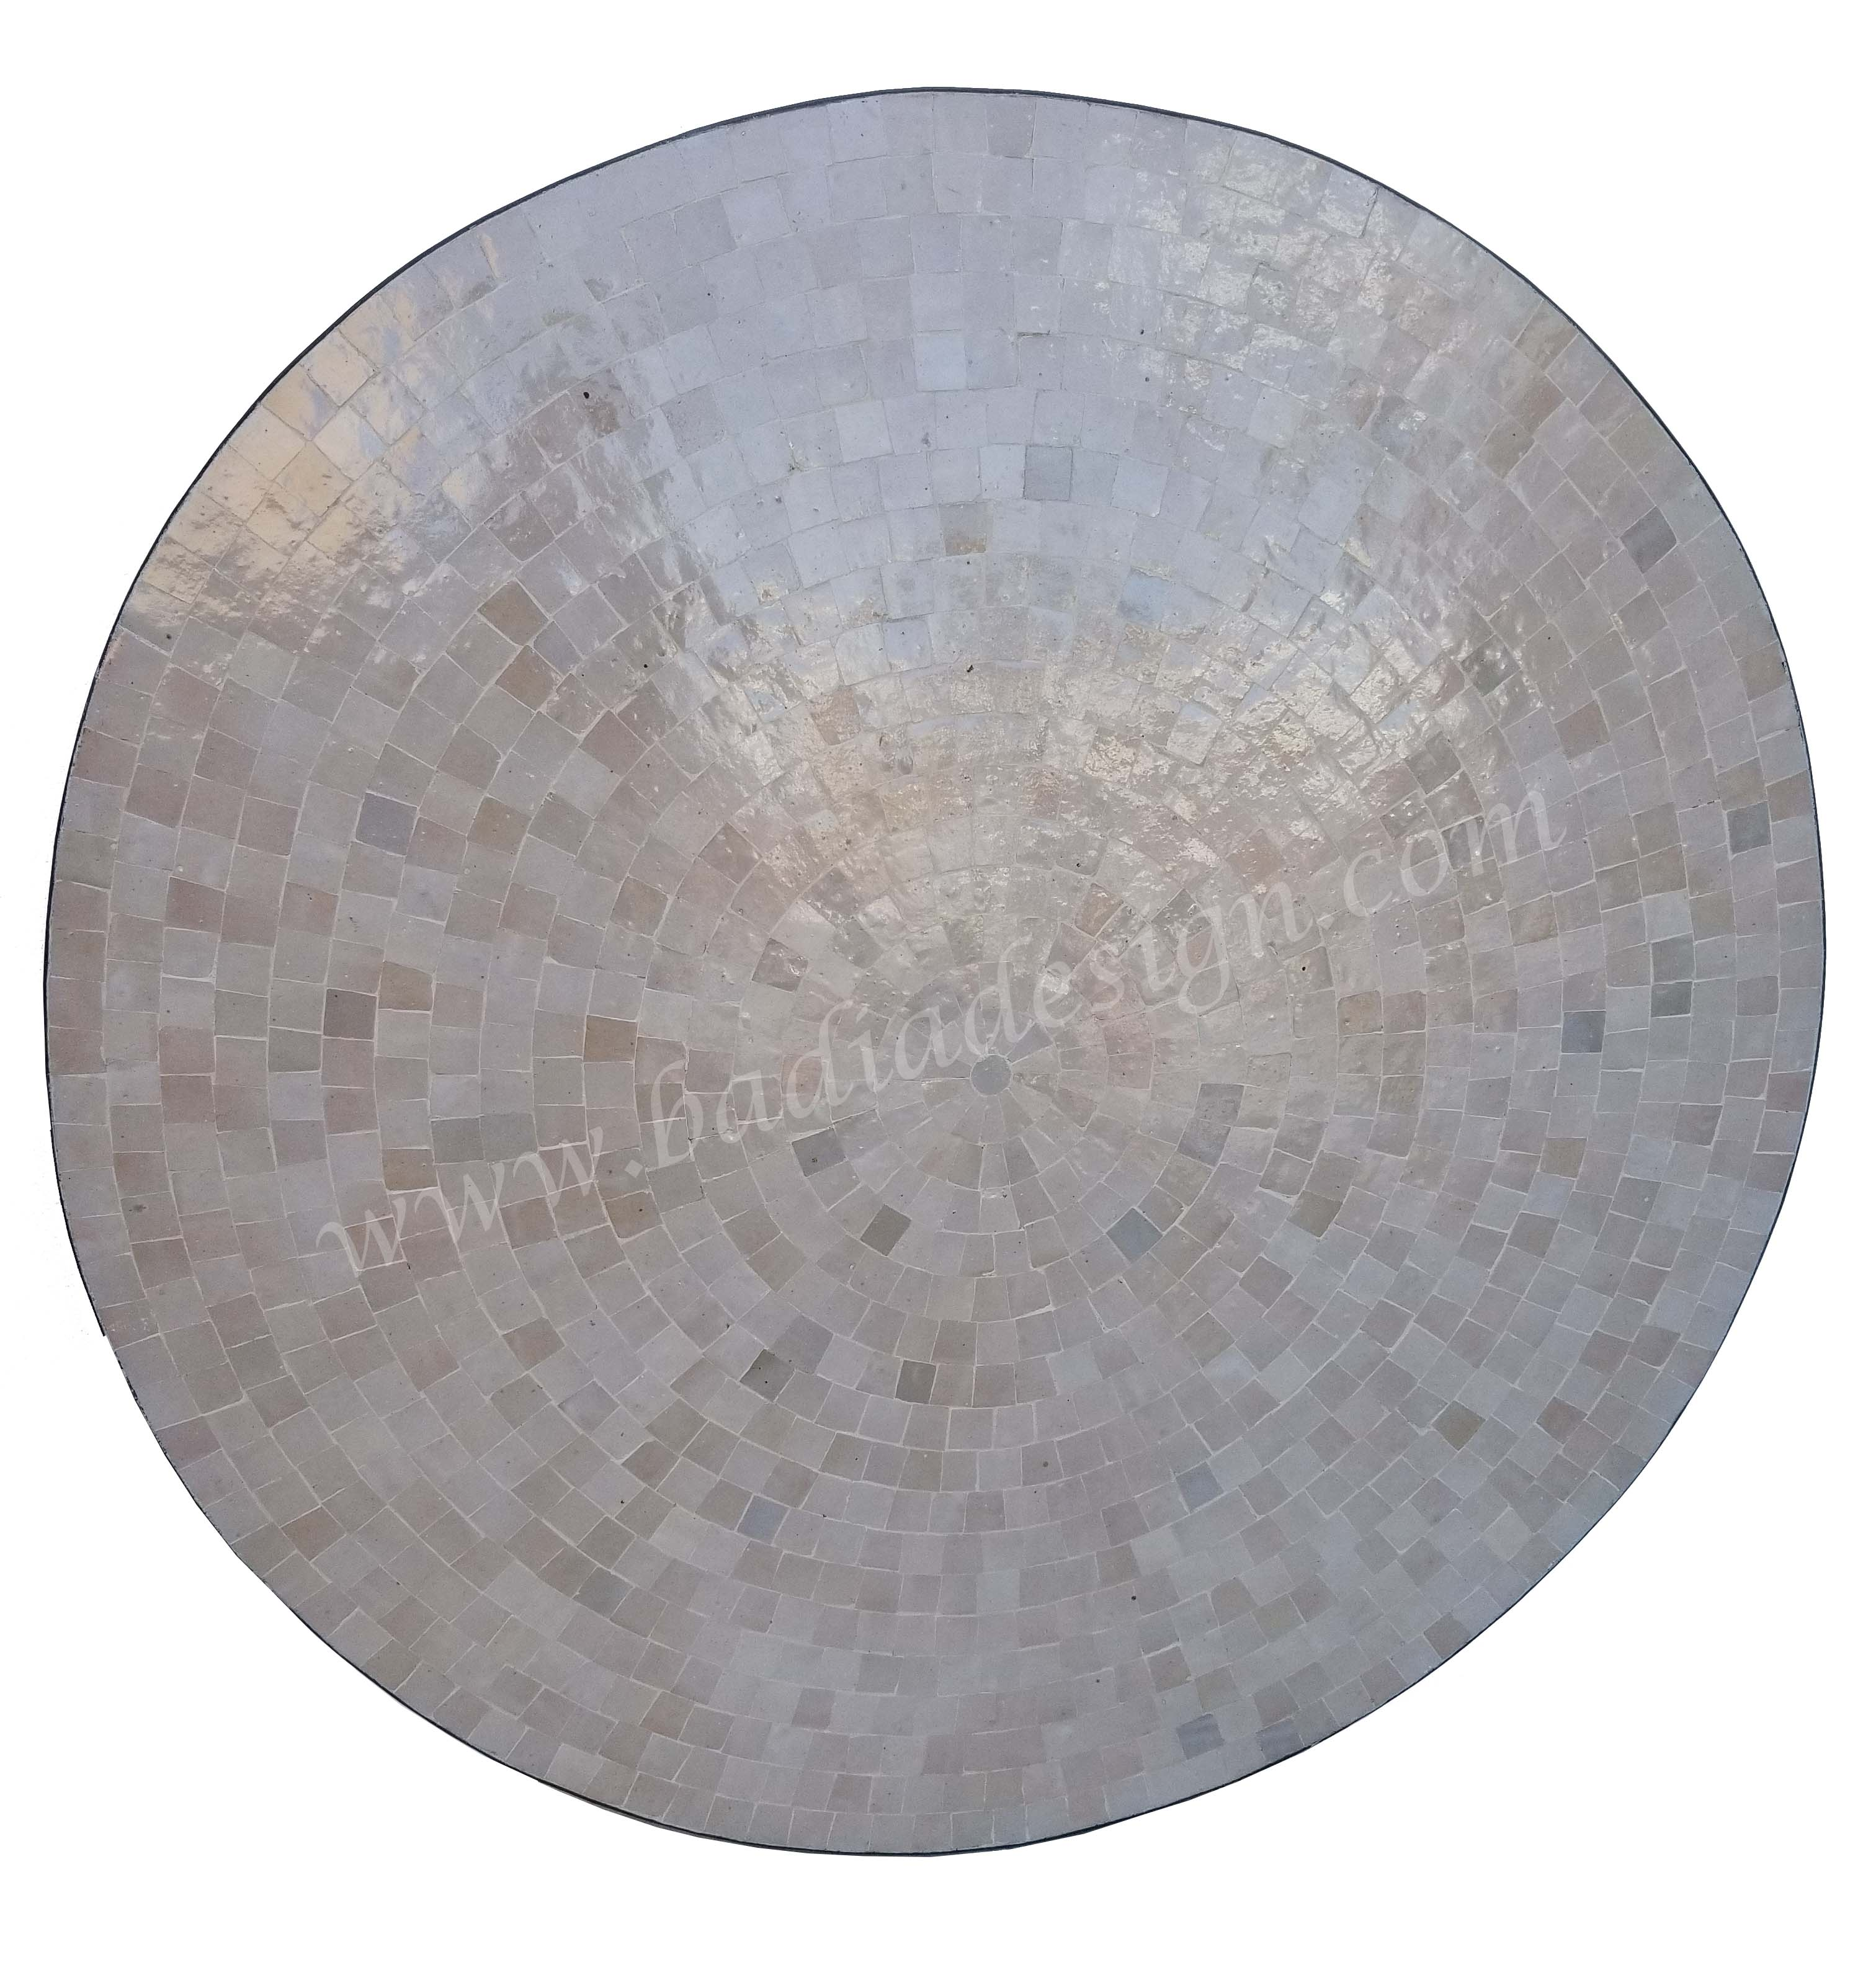 moroccan-mosaic-tile-table-top-mtr419.jpg